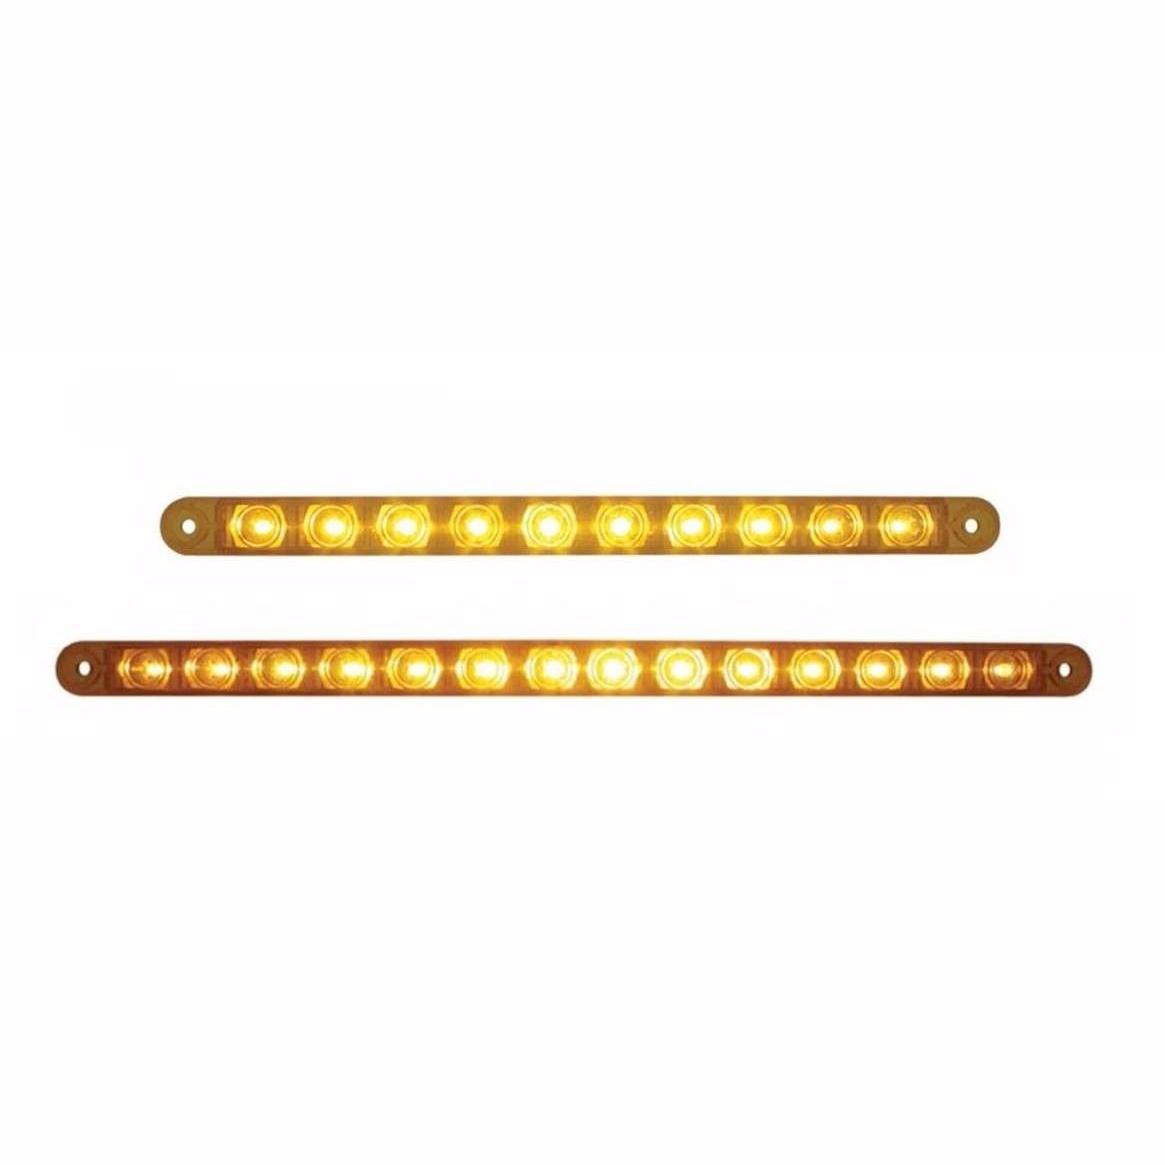 10 LED and 14 LED Turn Signal Light Bars (Amber/Amber) SET (#38942  #38946)